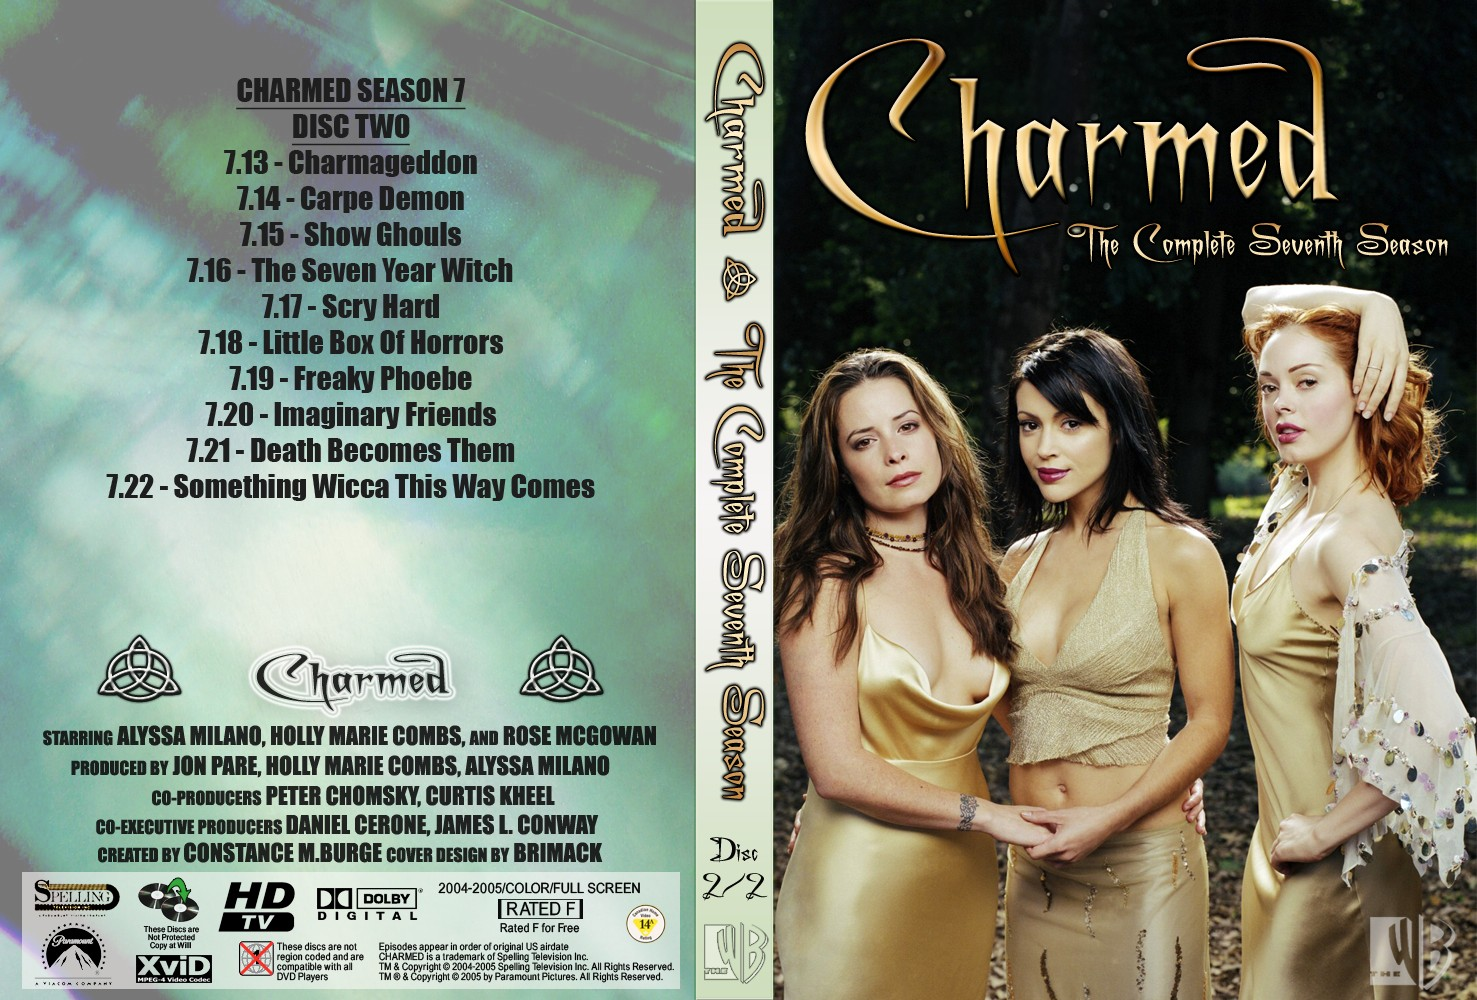 Make Download Like a Heaven: CHARMED SEASON 1 - 8 (COMPLETE